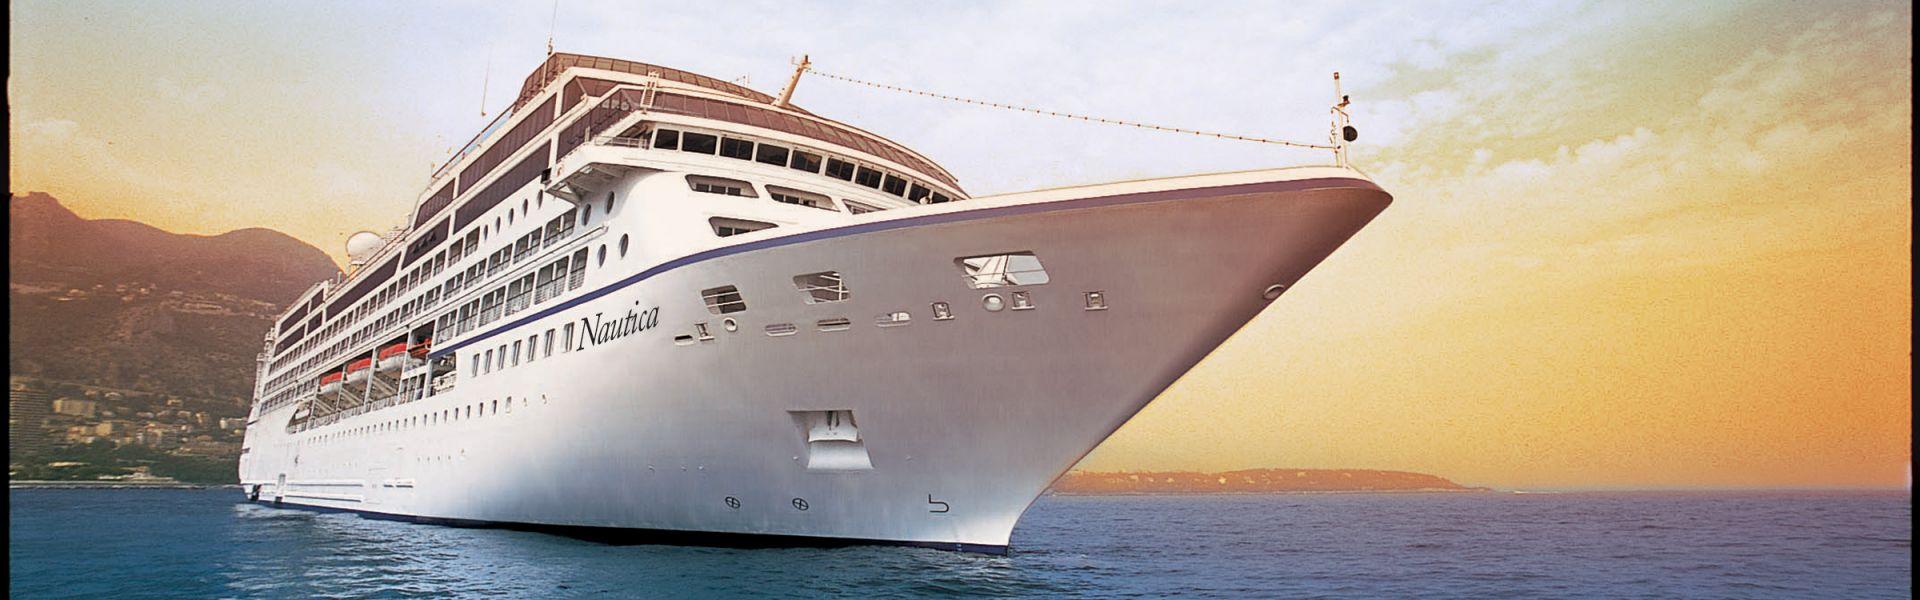 Croaziera 2018 - Asia/Africa si Orientul Mijlociu (Singapore) - Oceania Cruises - Nautica - 16 nopti